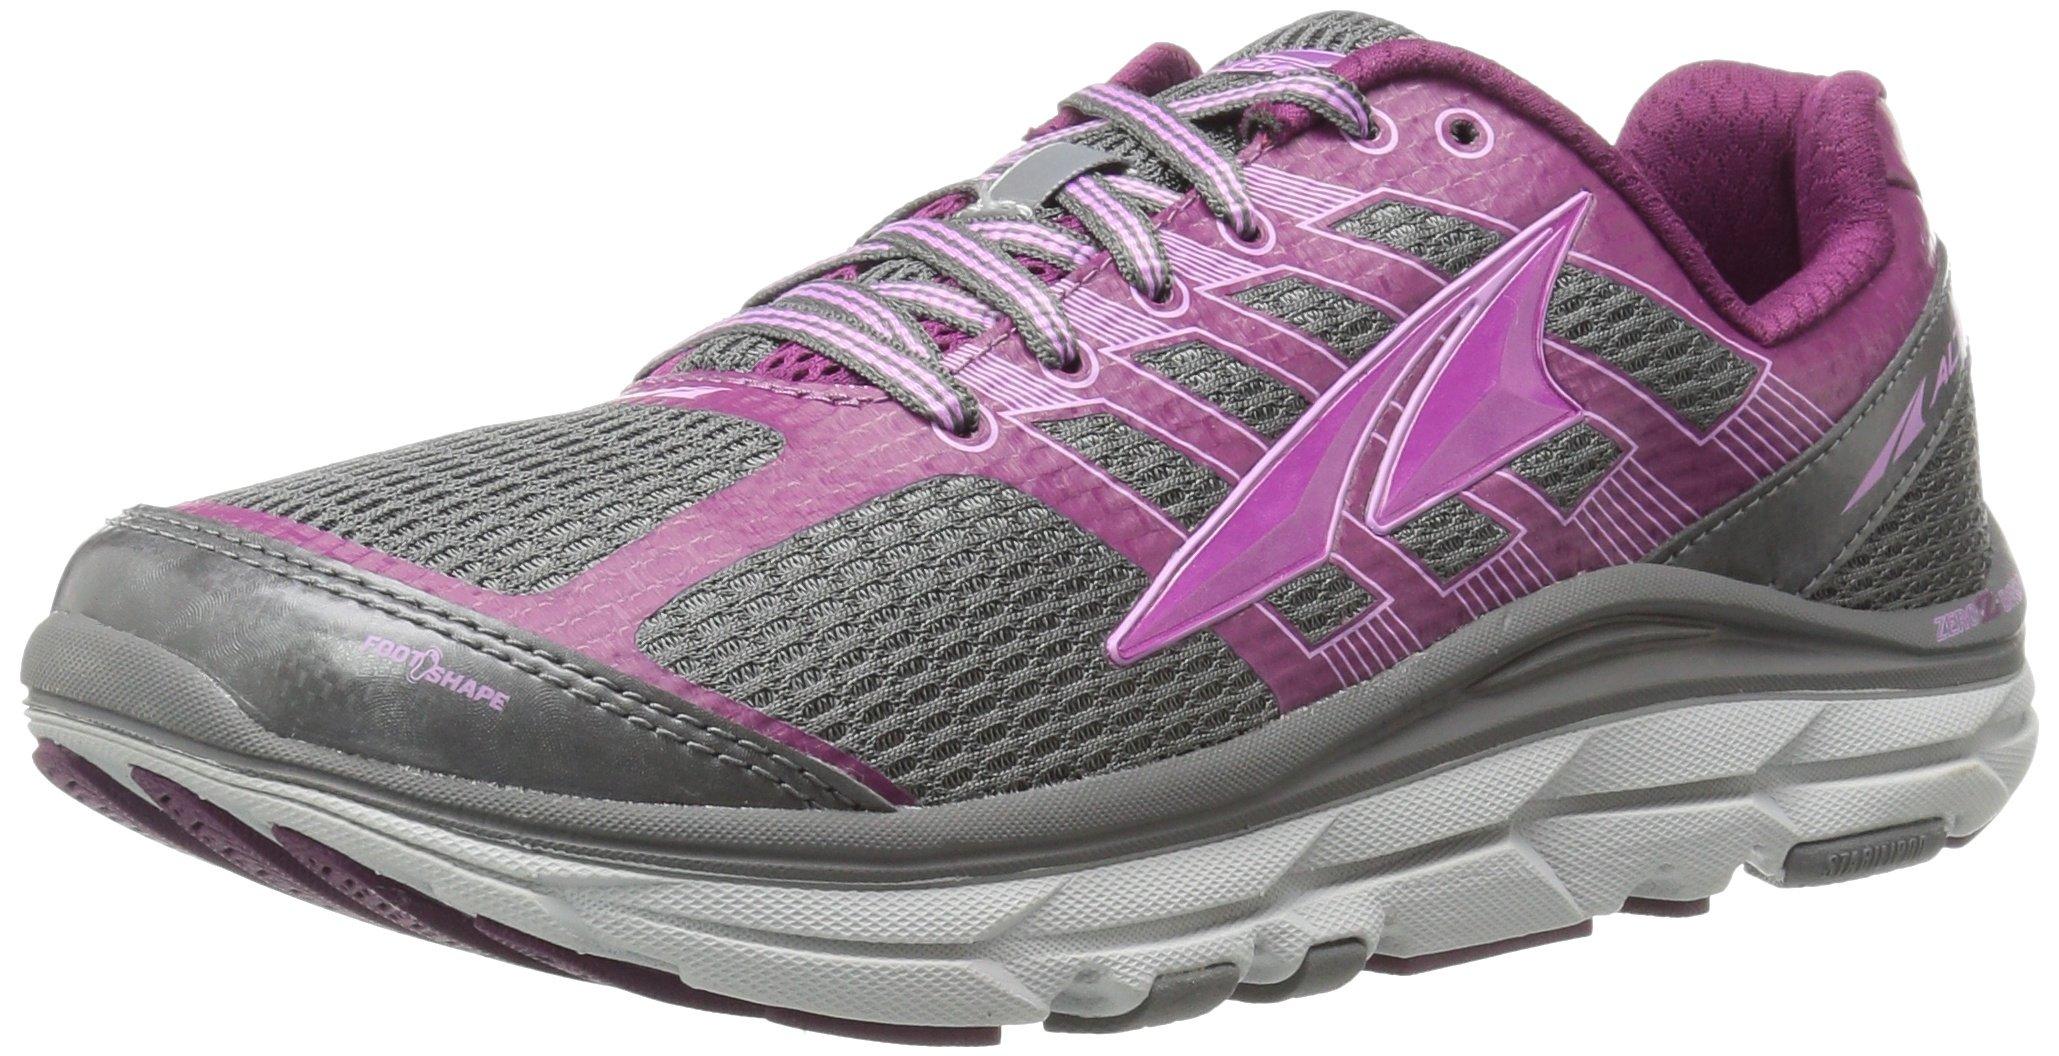 Altra Provision 3.0 Women's Road Running Shoe, Gray/Purple, 8.5